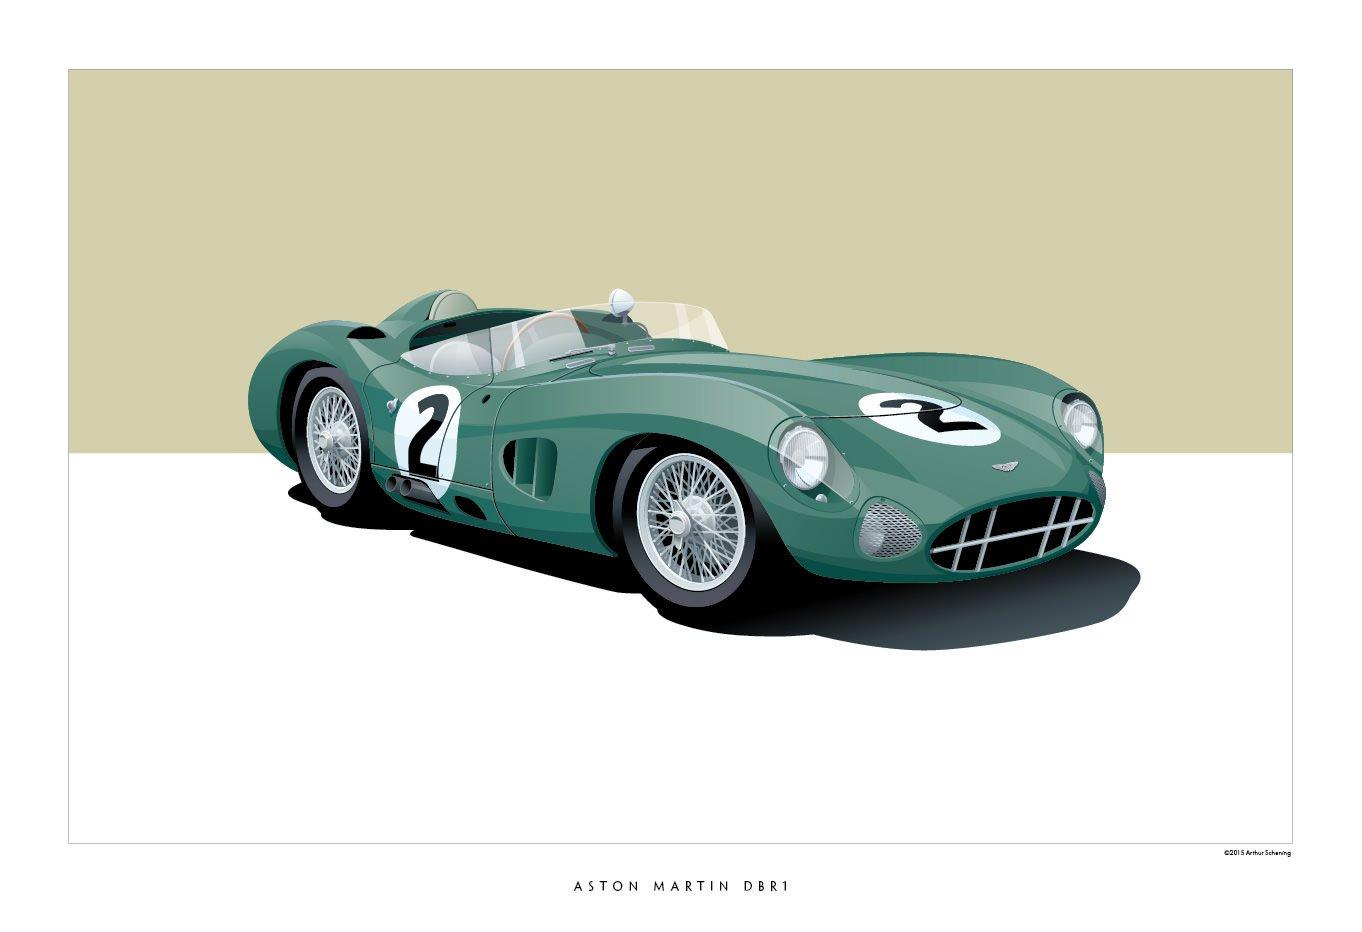 Aston-Martin-DBR1